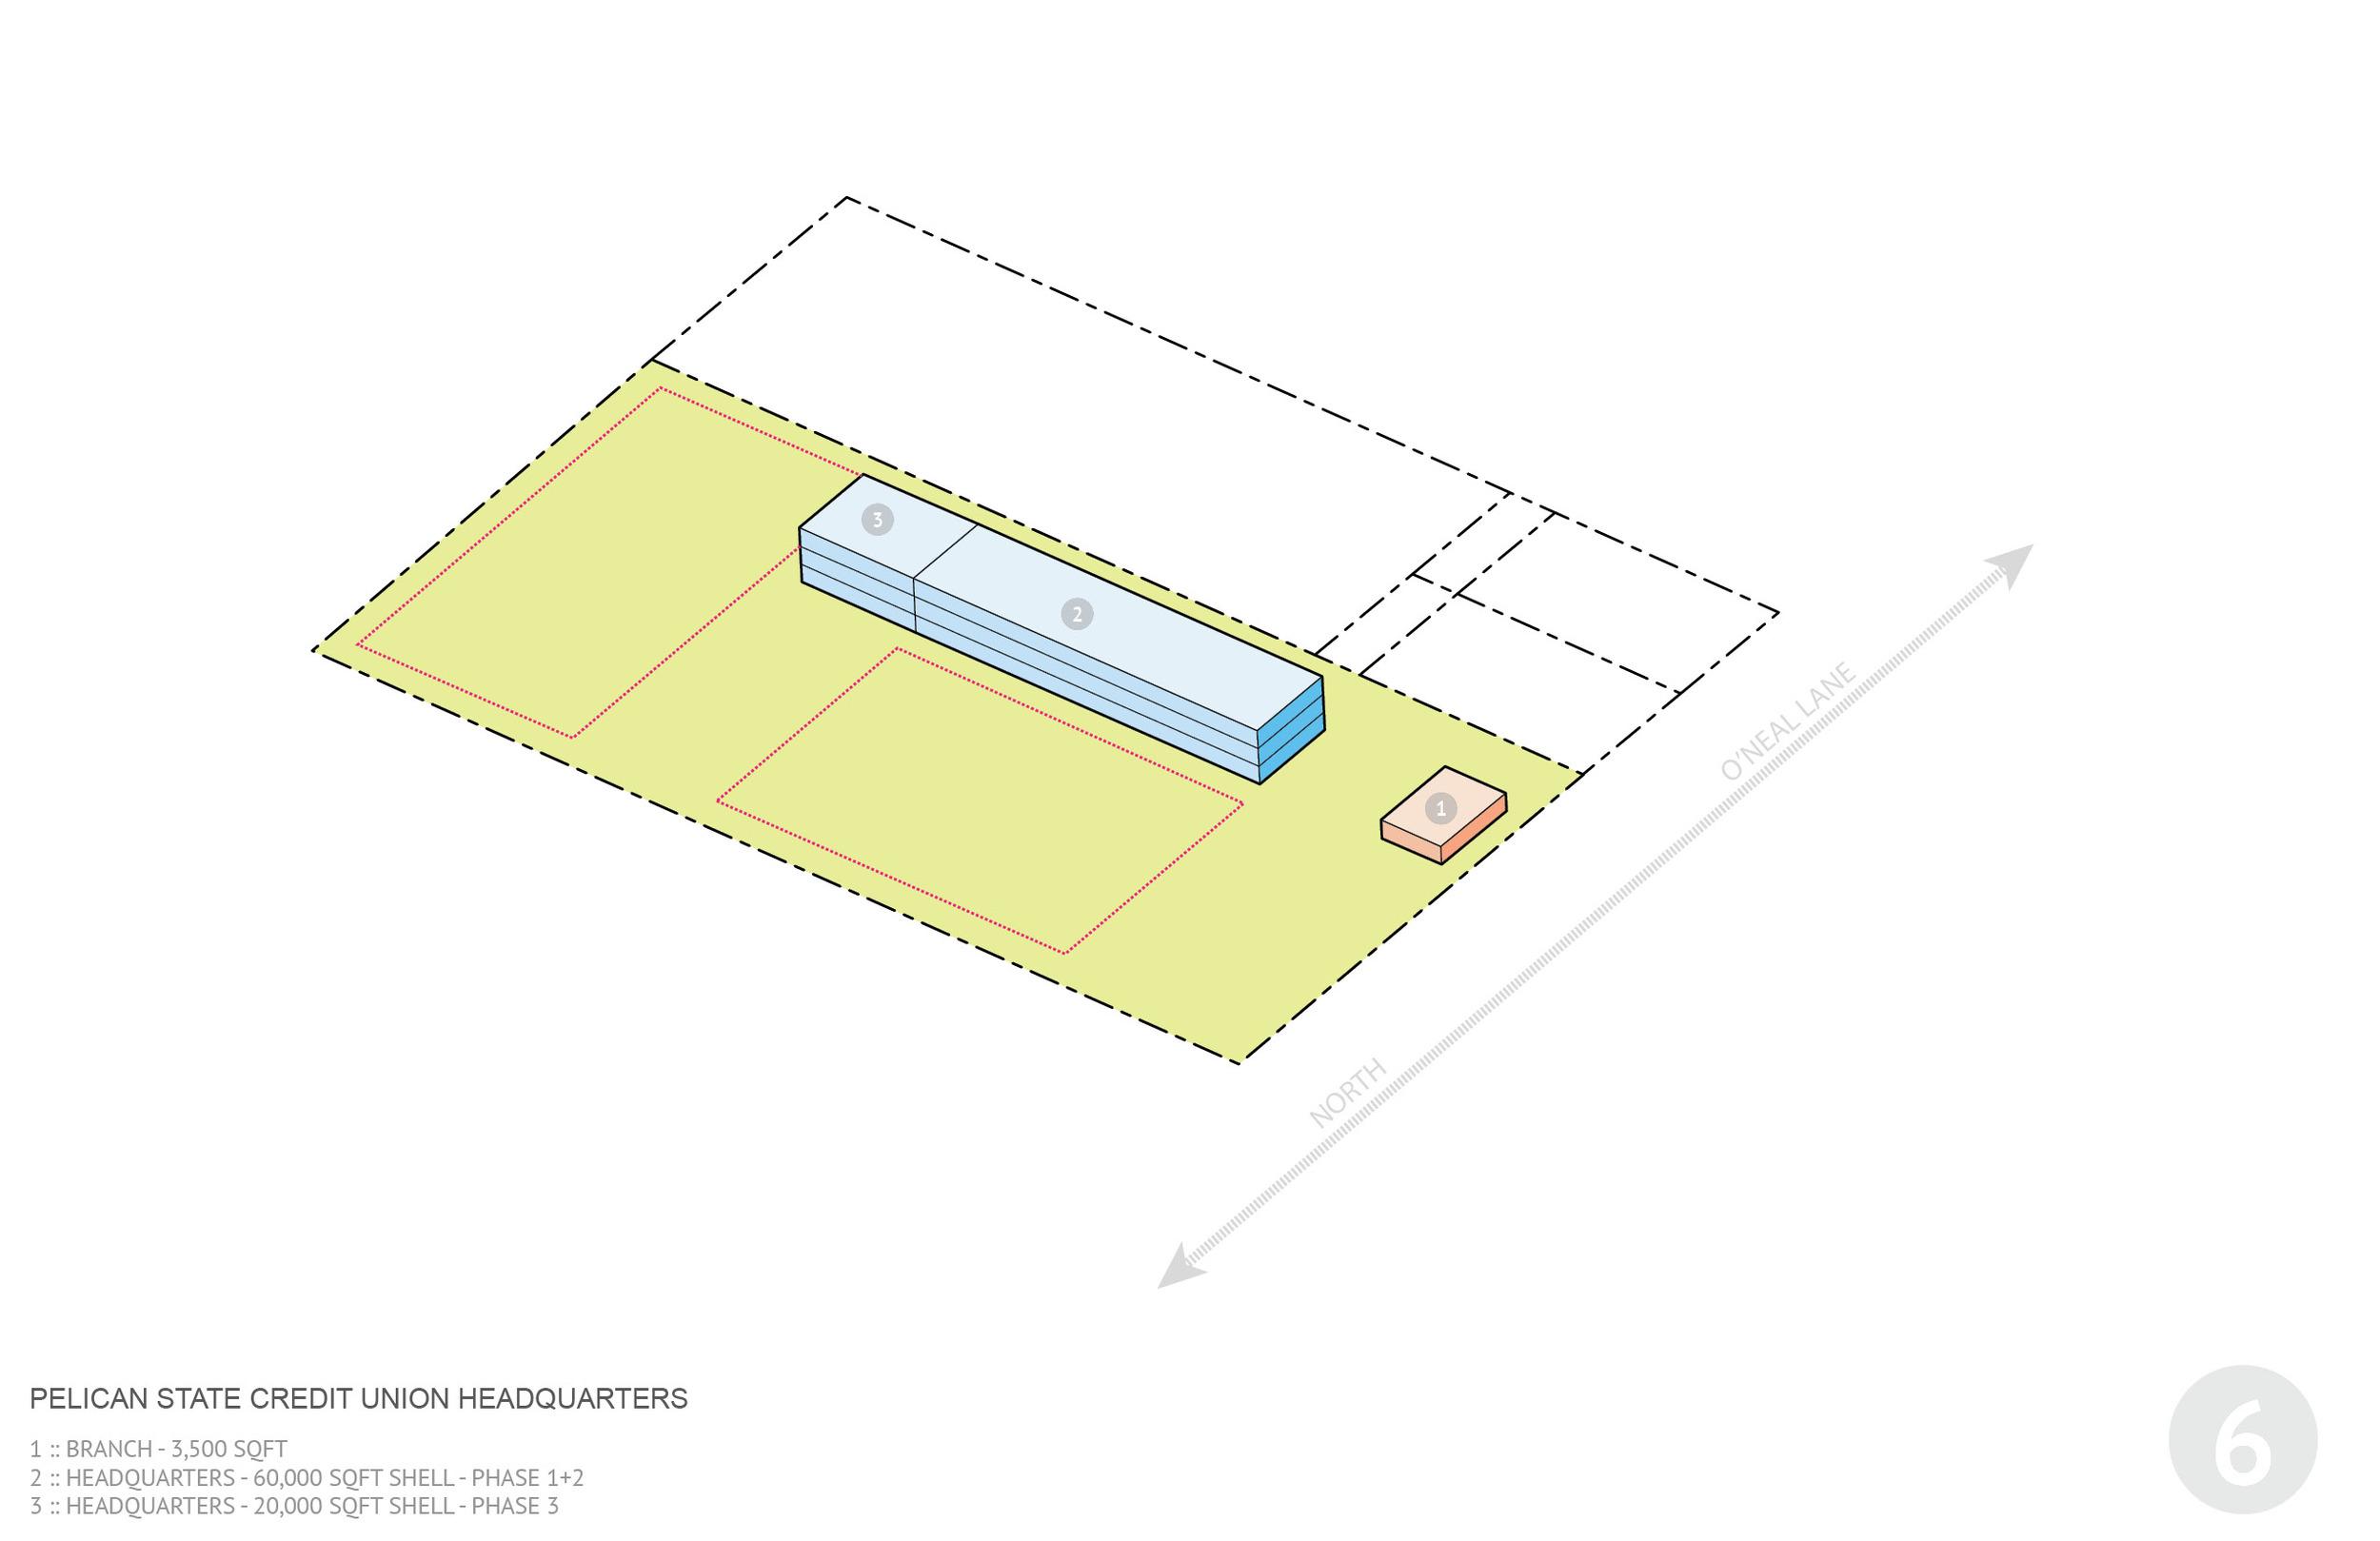 A_SlideshowDiagram_6.jpg